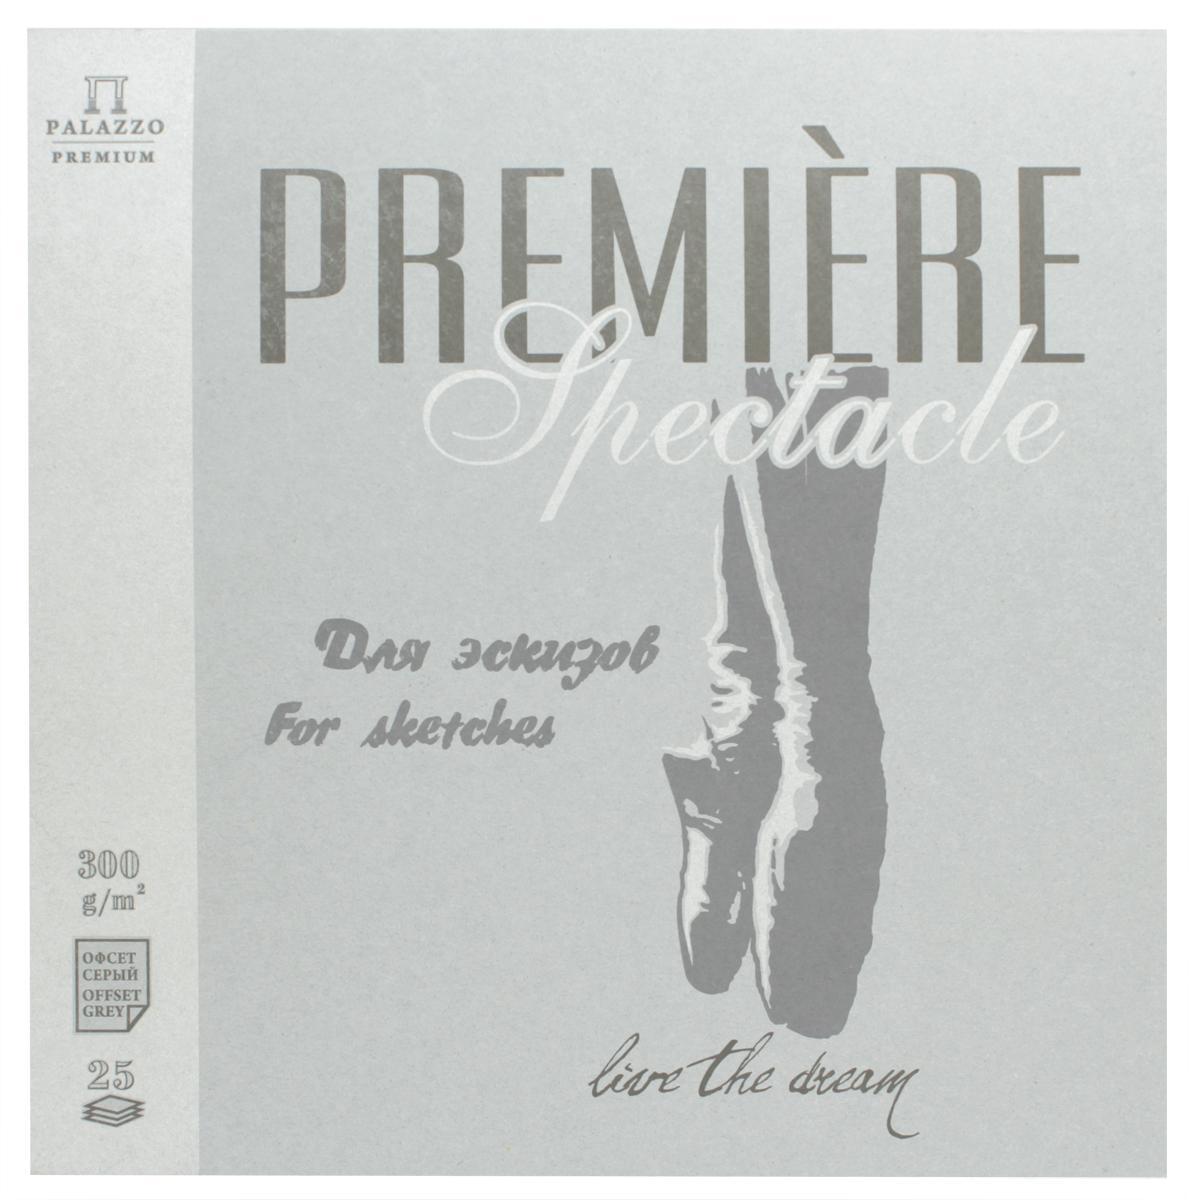 Палаццо Альбом для эскизов Premiere Spectacle 25 листов альбом для эскизов палаццо модель 40 листов формат а3